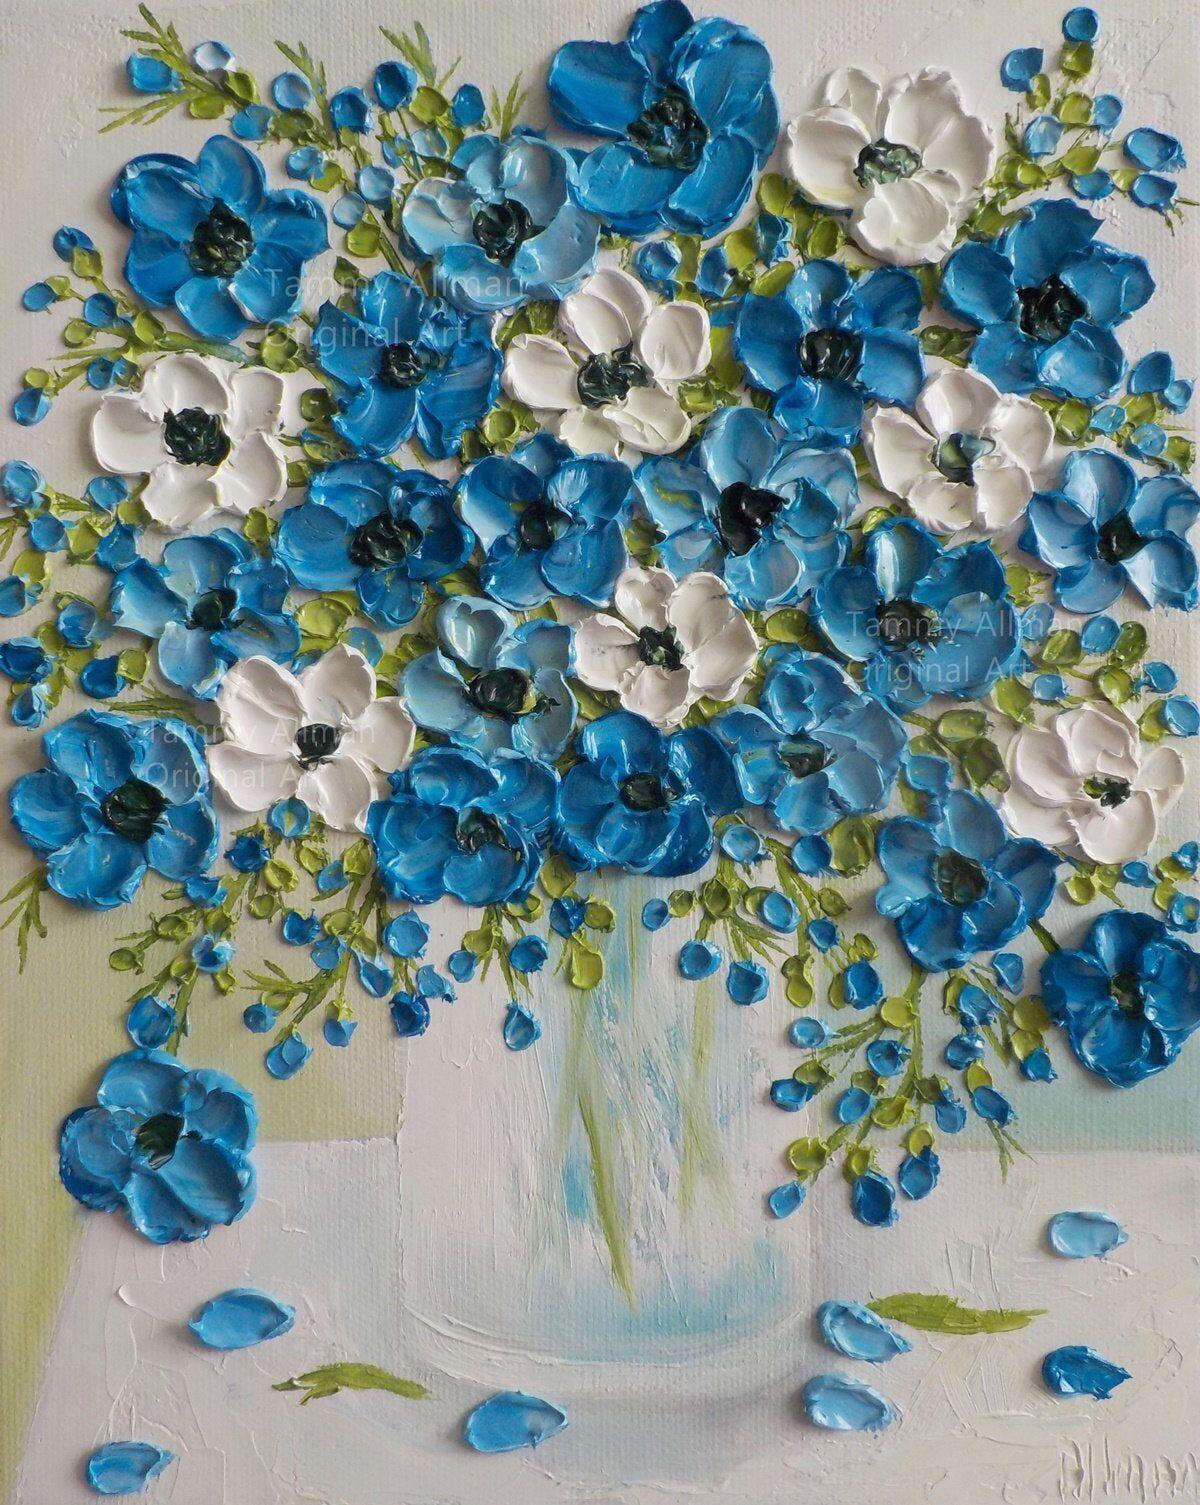 Custom Indigo Blue And White Anemone Oil Impasto Original Etsy In 2020 Anemone Flower Flower Painting White Anemone